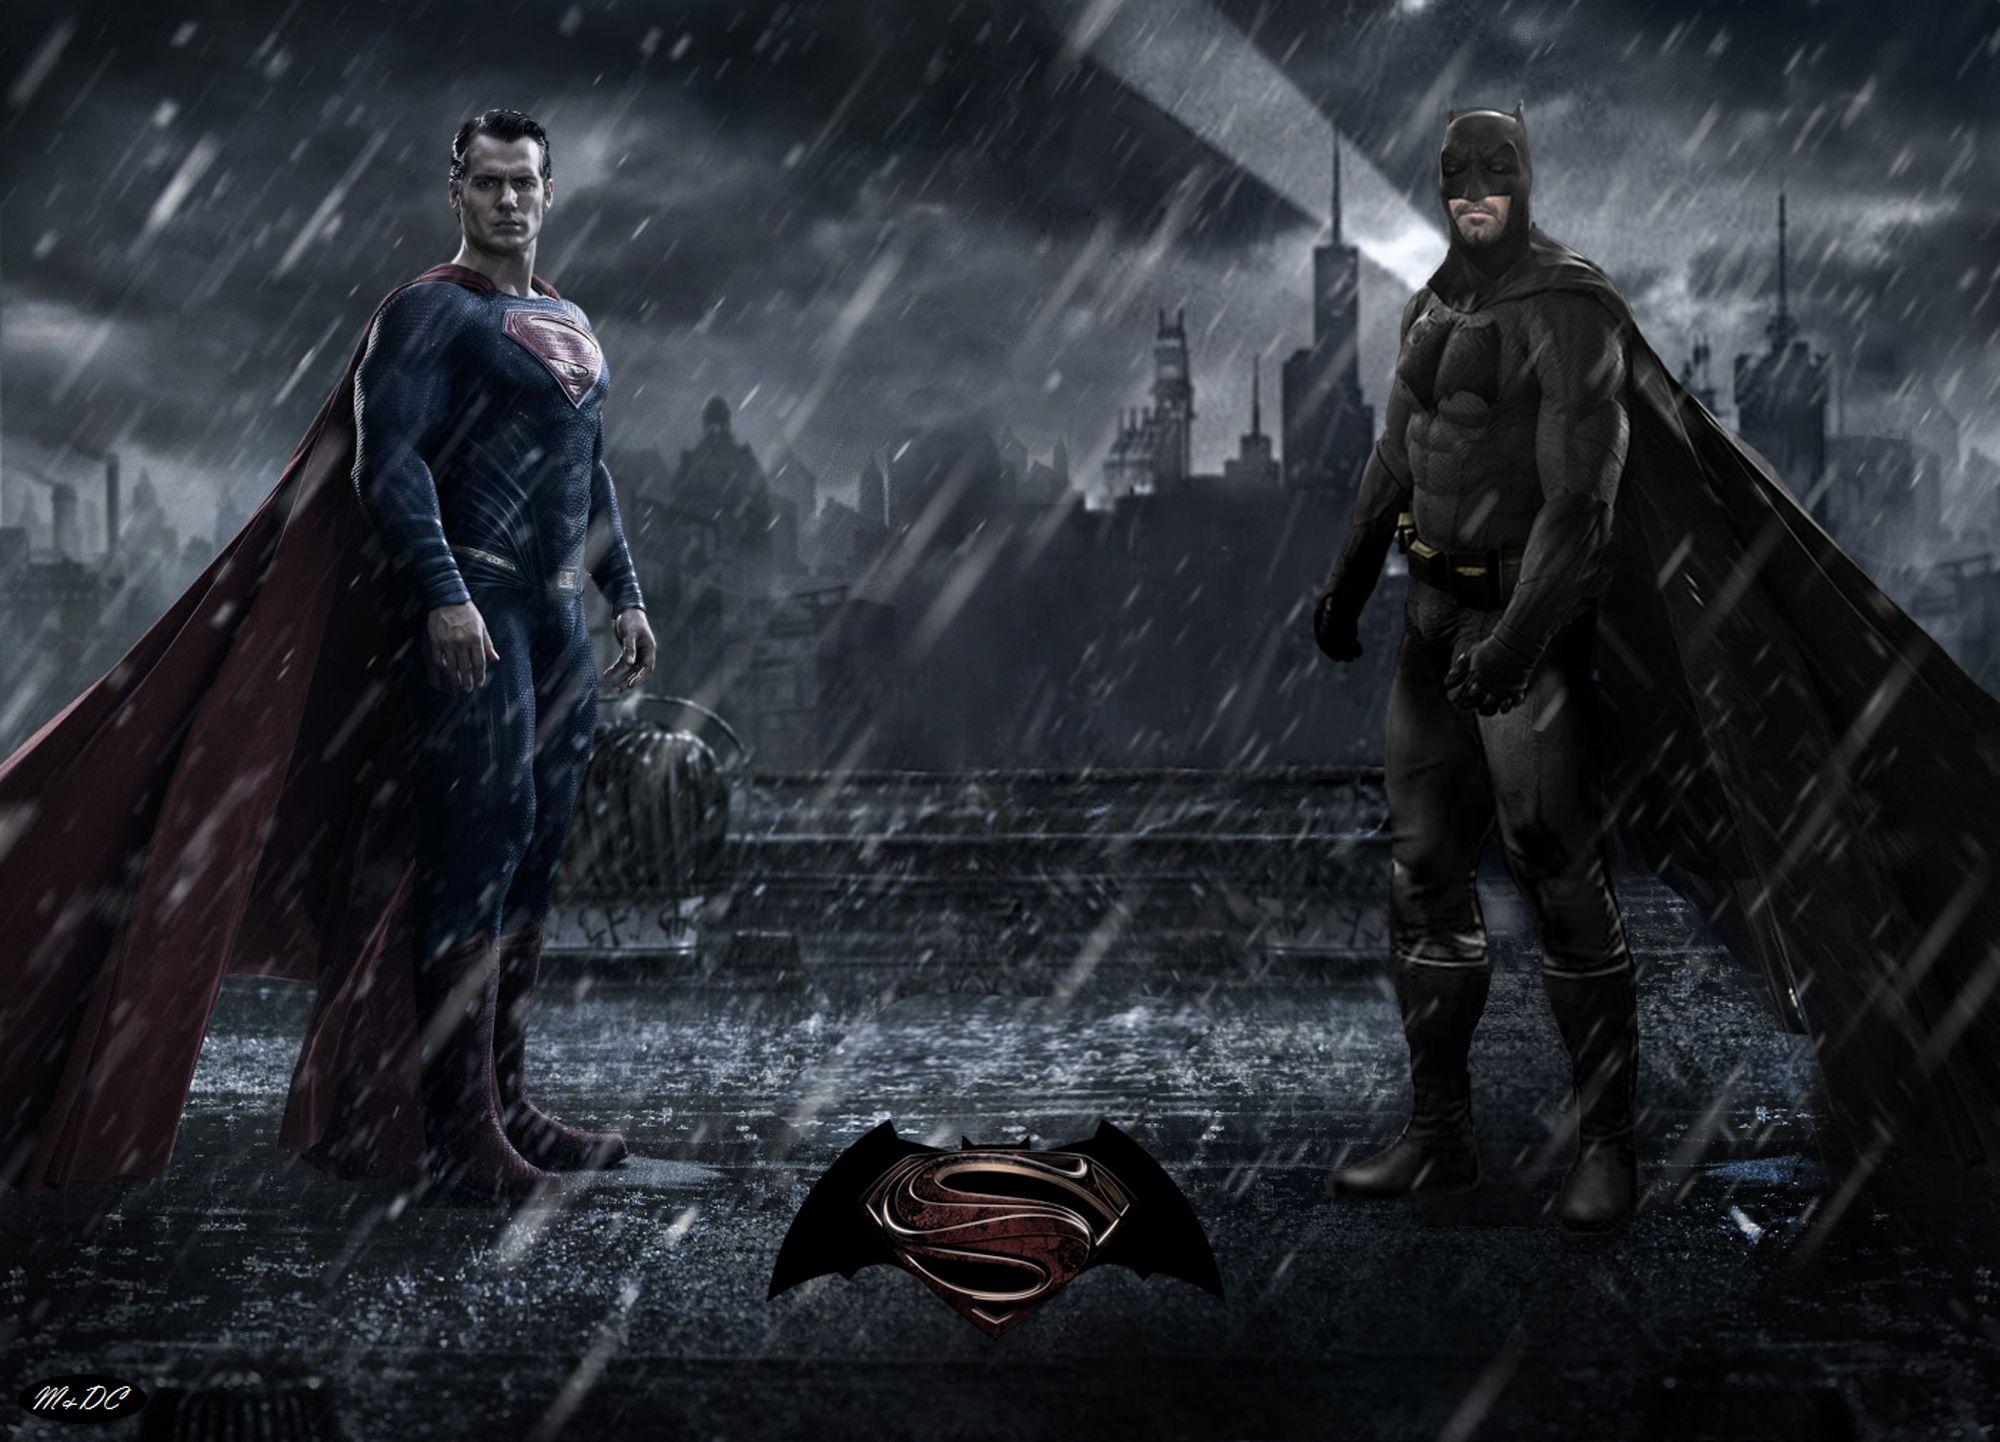 batman vs superman hd wallpapers 11 #batmanvssupermanhdwallpapers